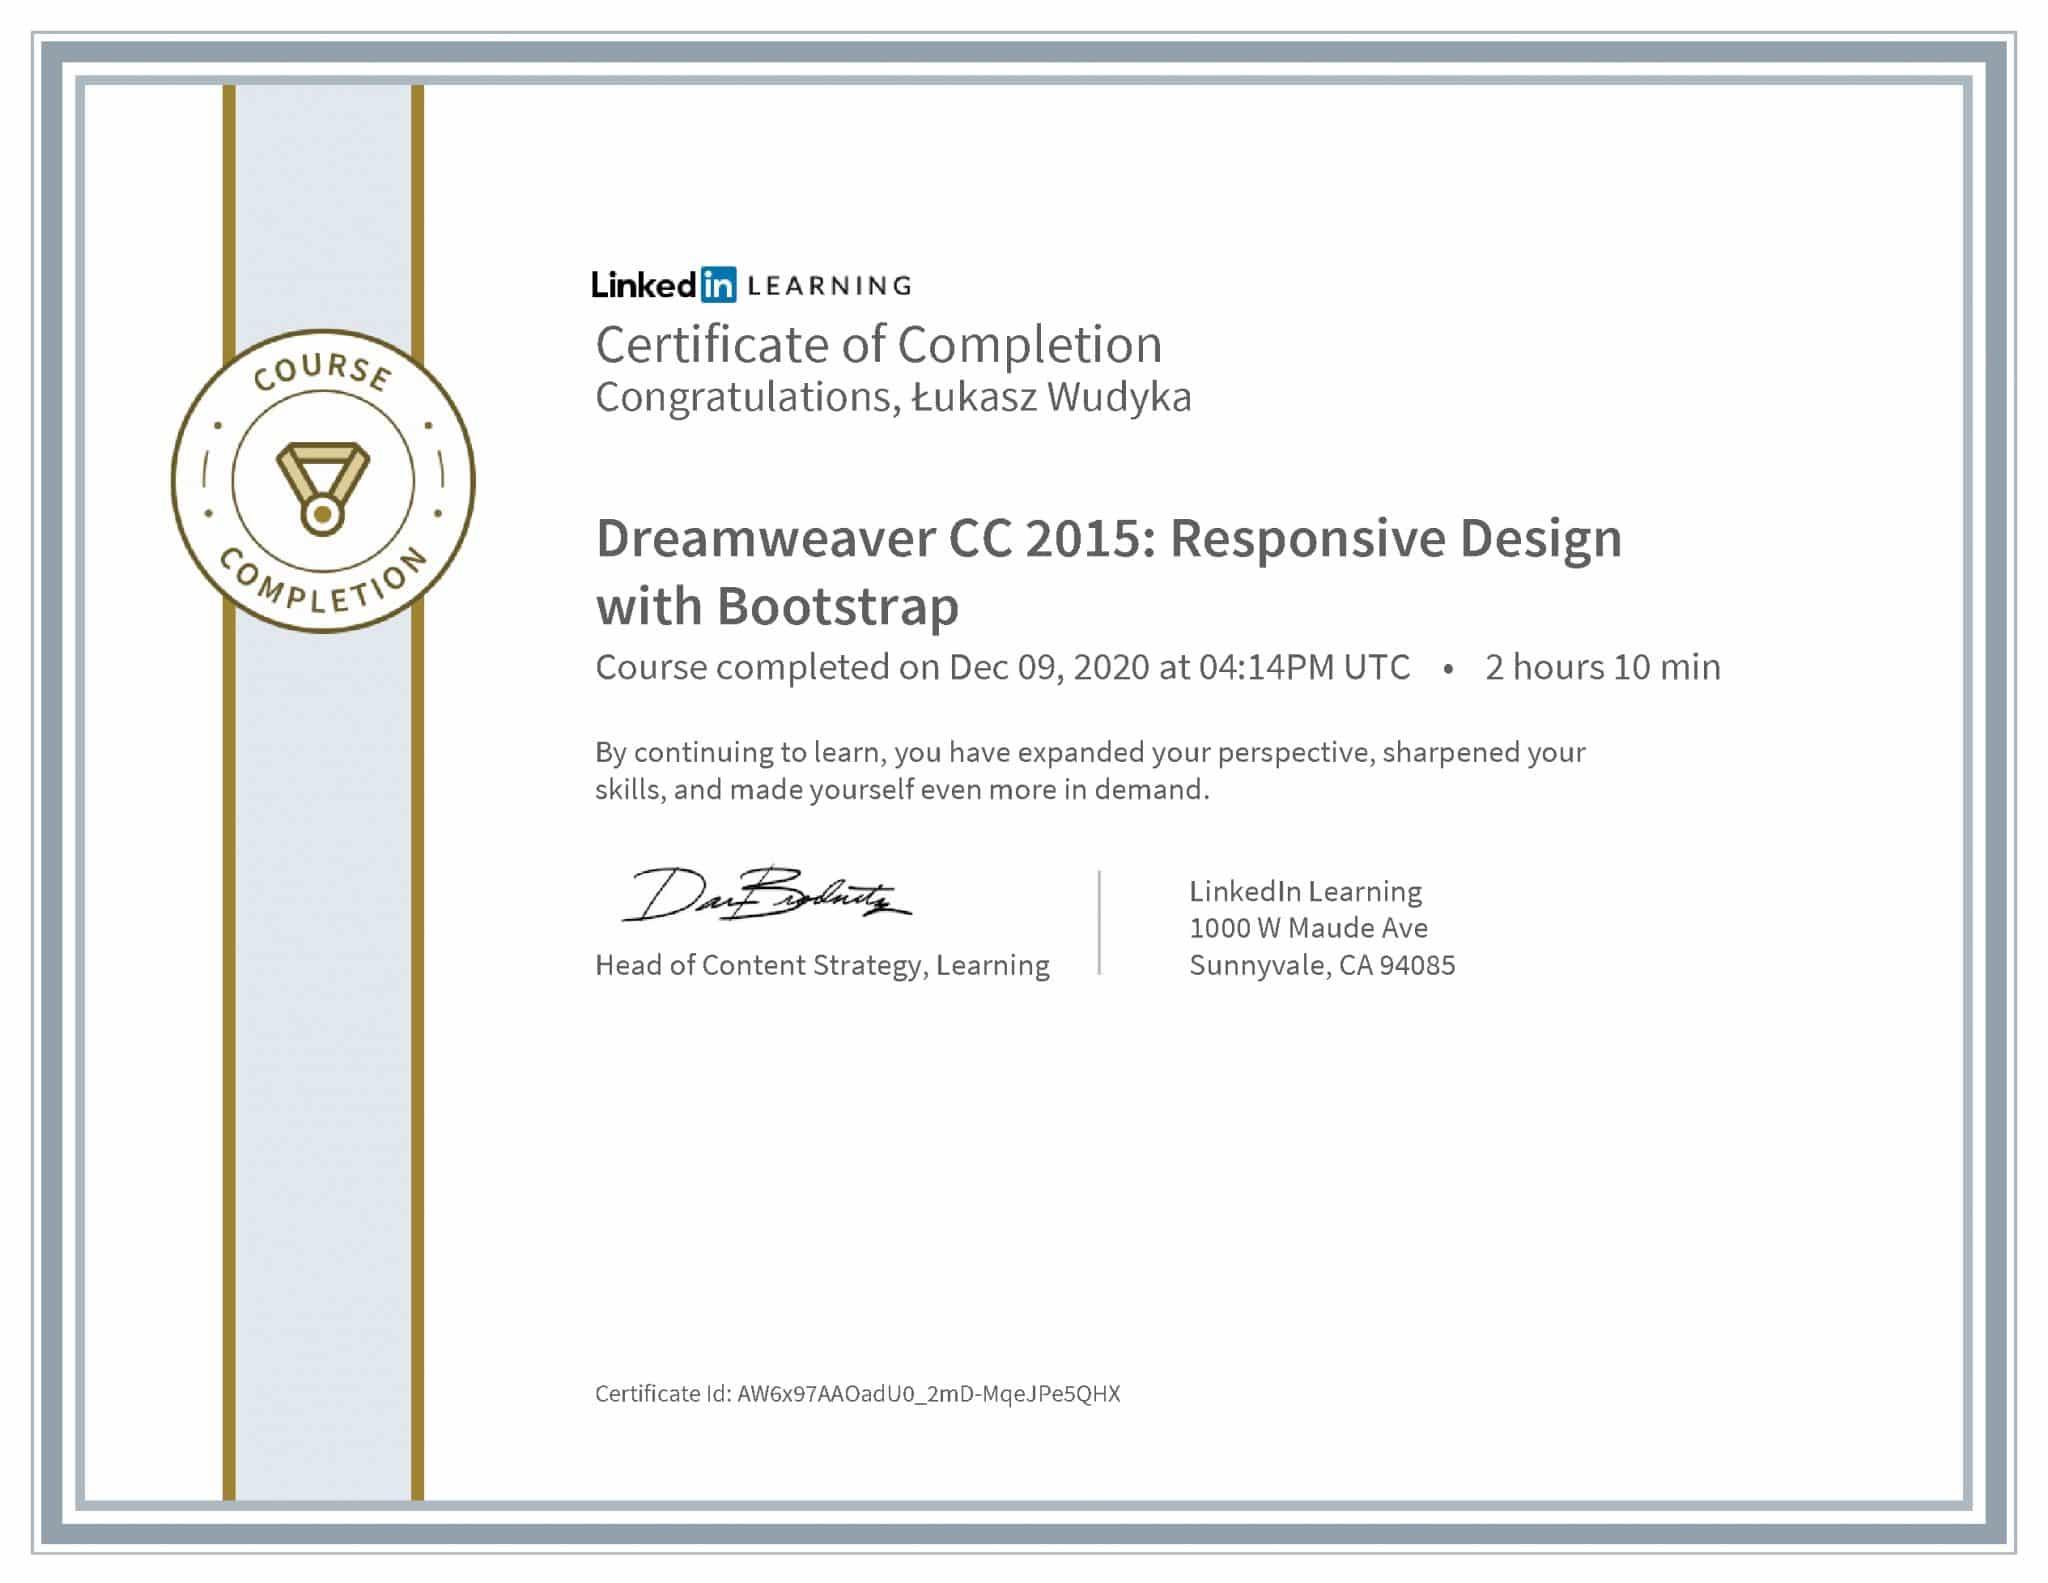 Łukasz Wudyka certyfikat LinkedIn Dreamweaver CC 2015: Responsive Design with Bootstrap